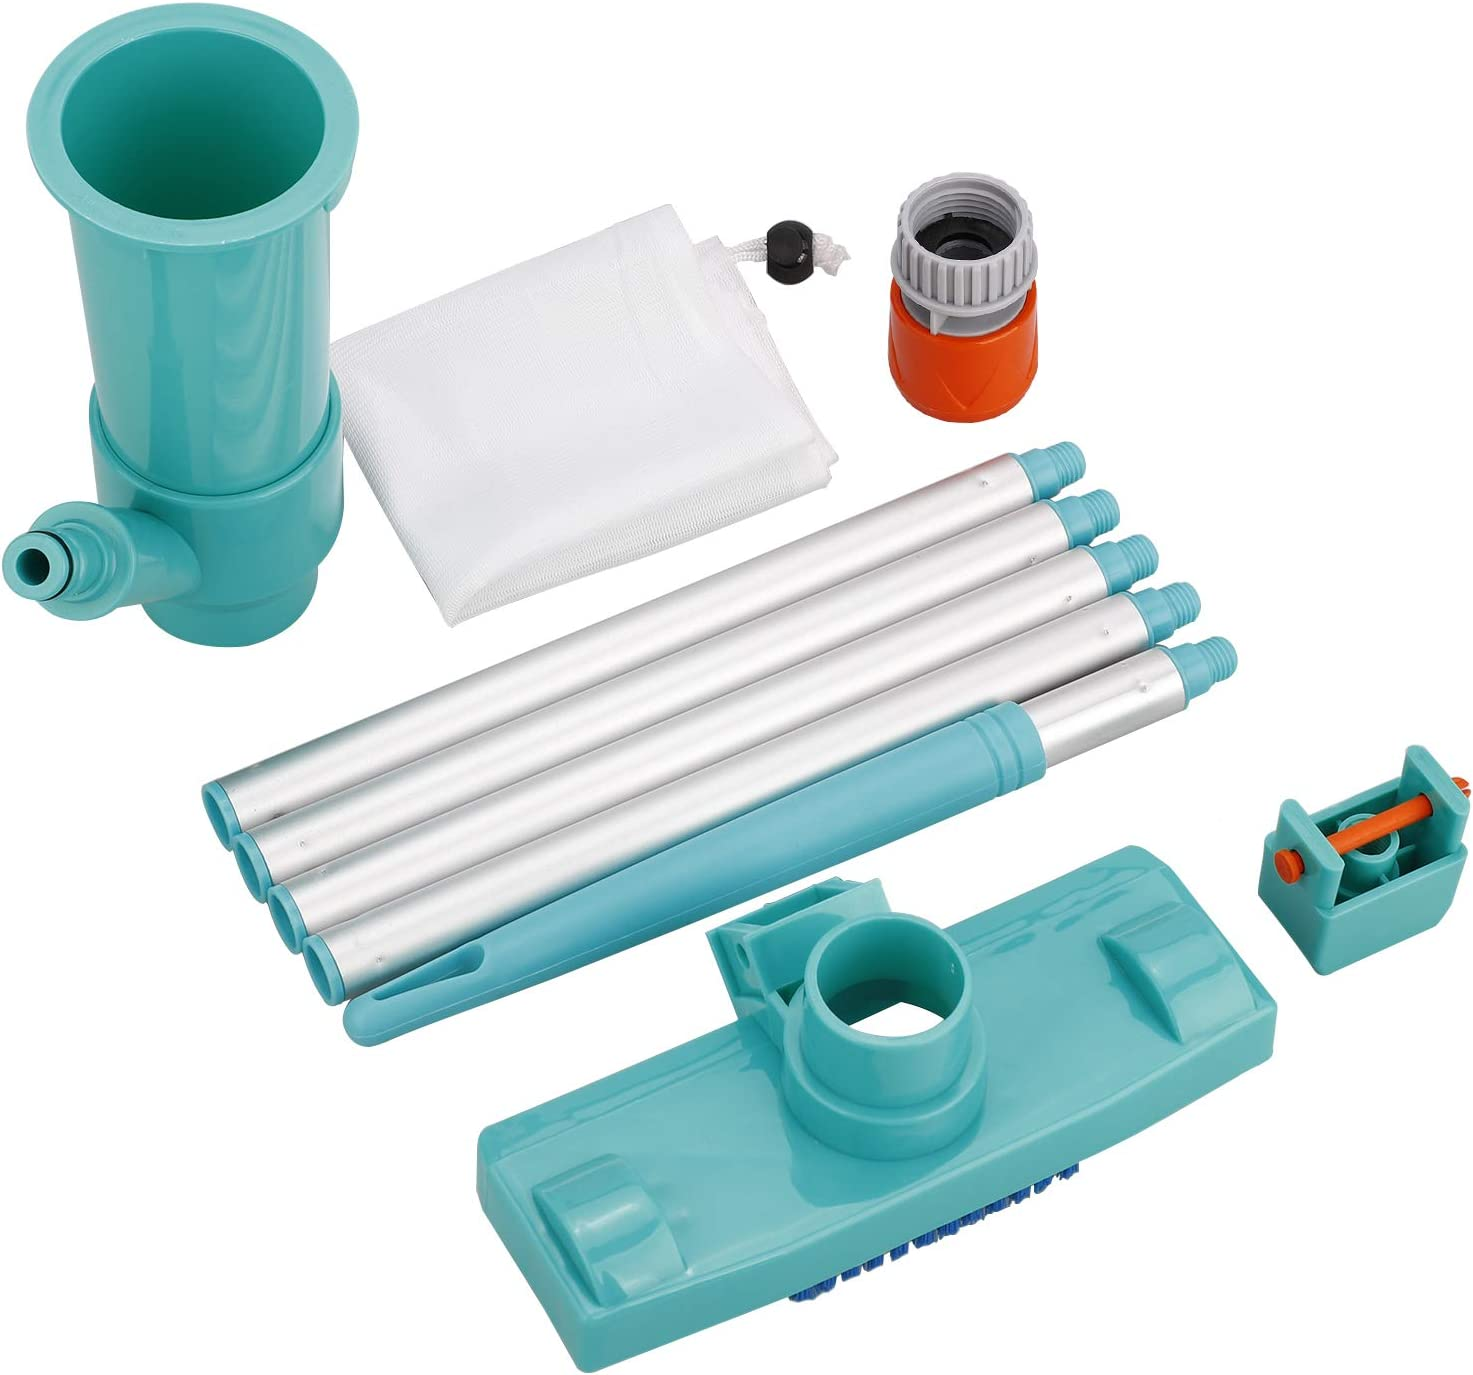 FGYZYP Portable Some reservation Pool Vacuum Under blast sales Jet Cleaner Clean Underwater Supply